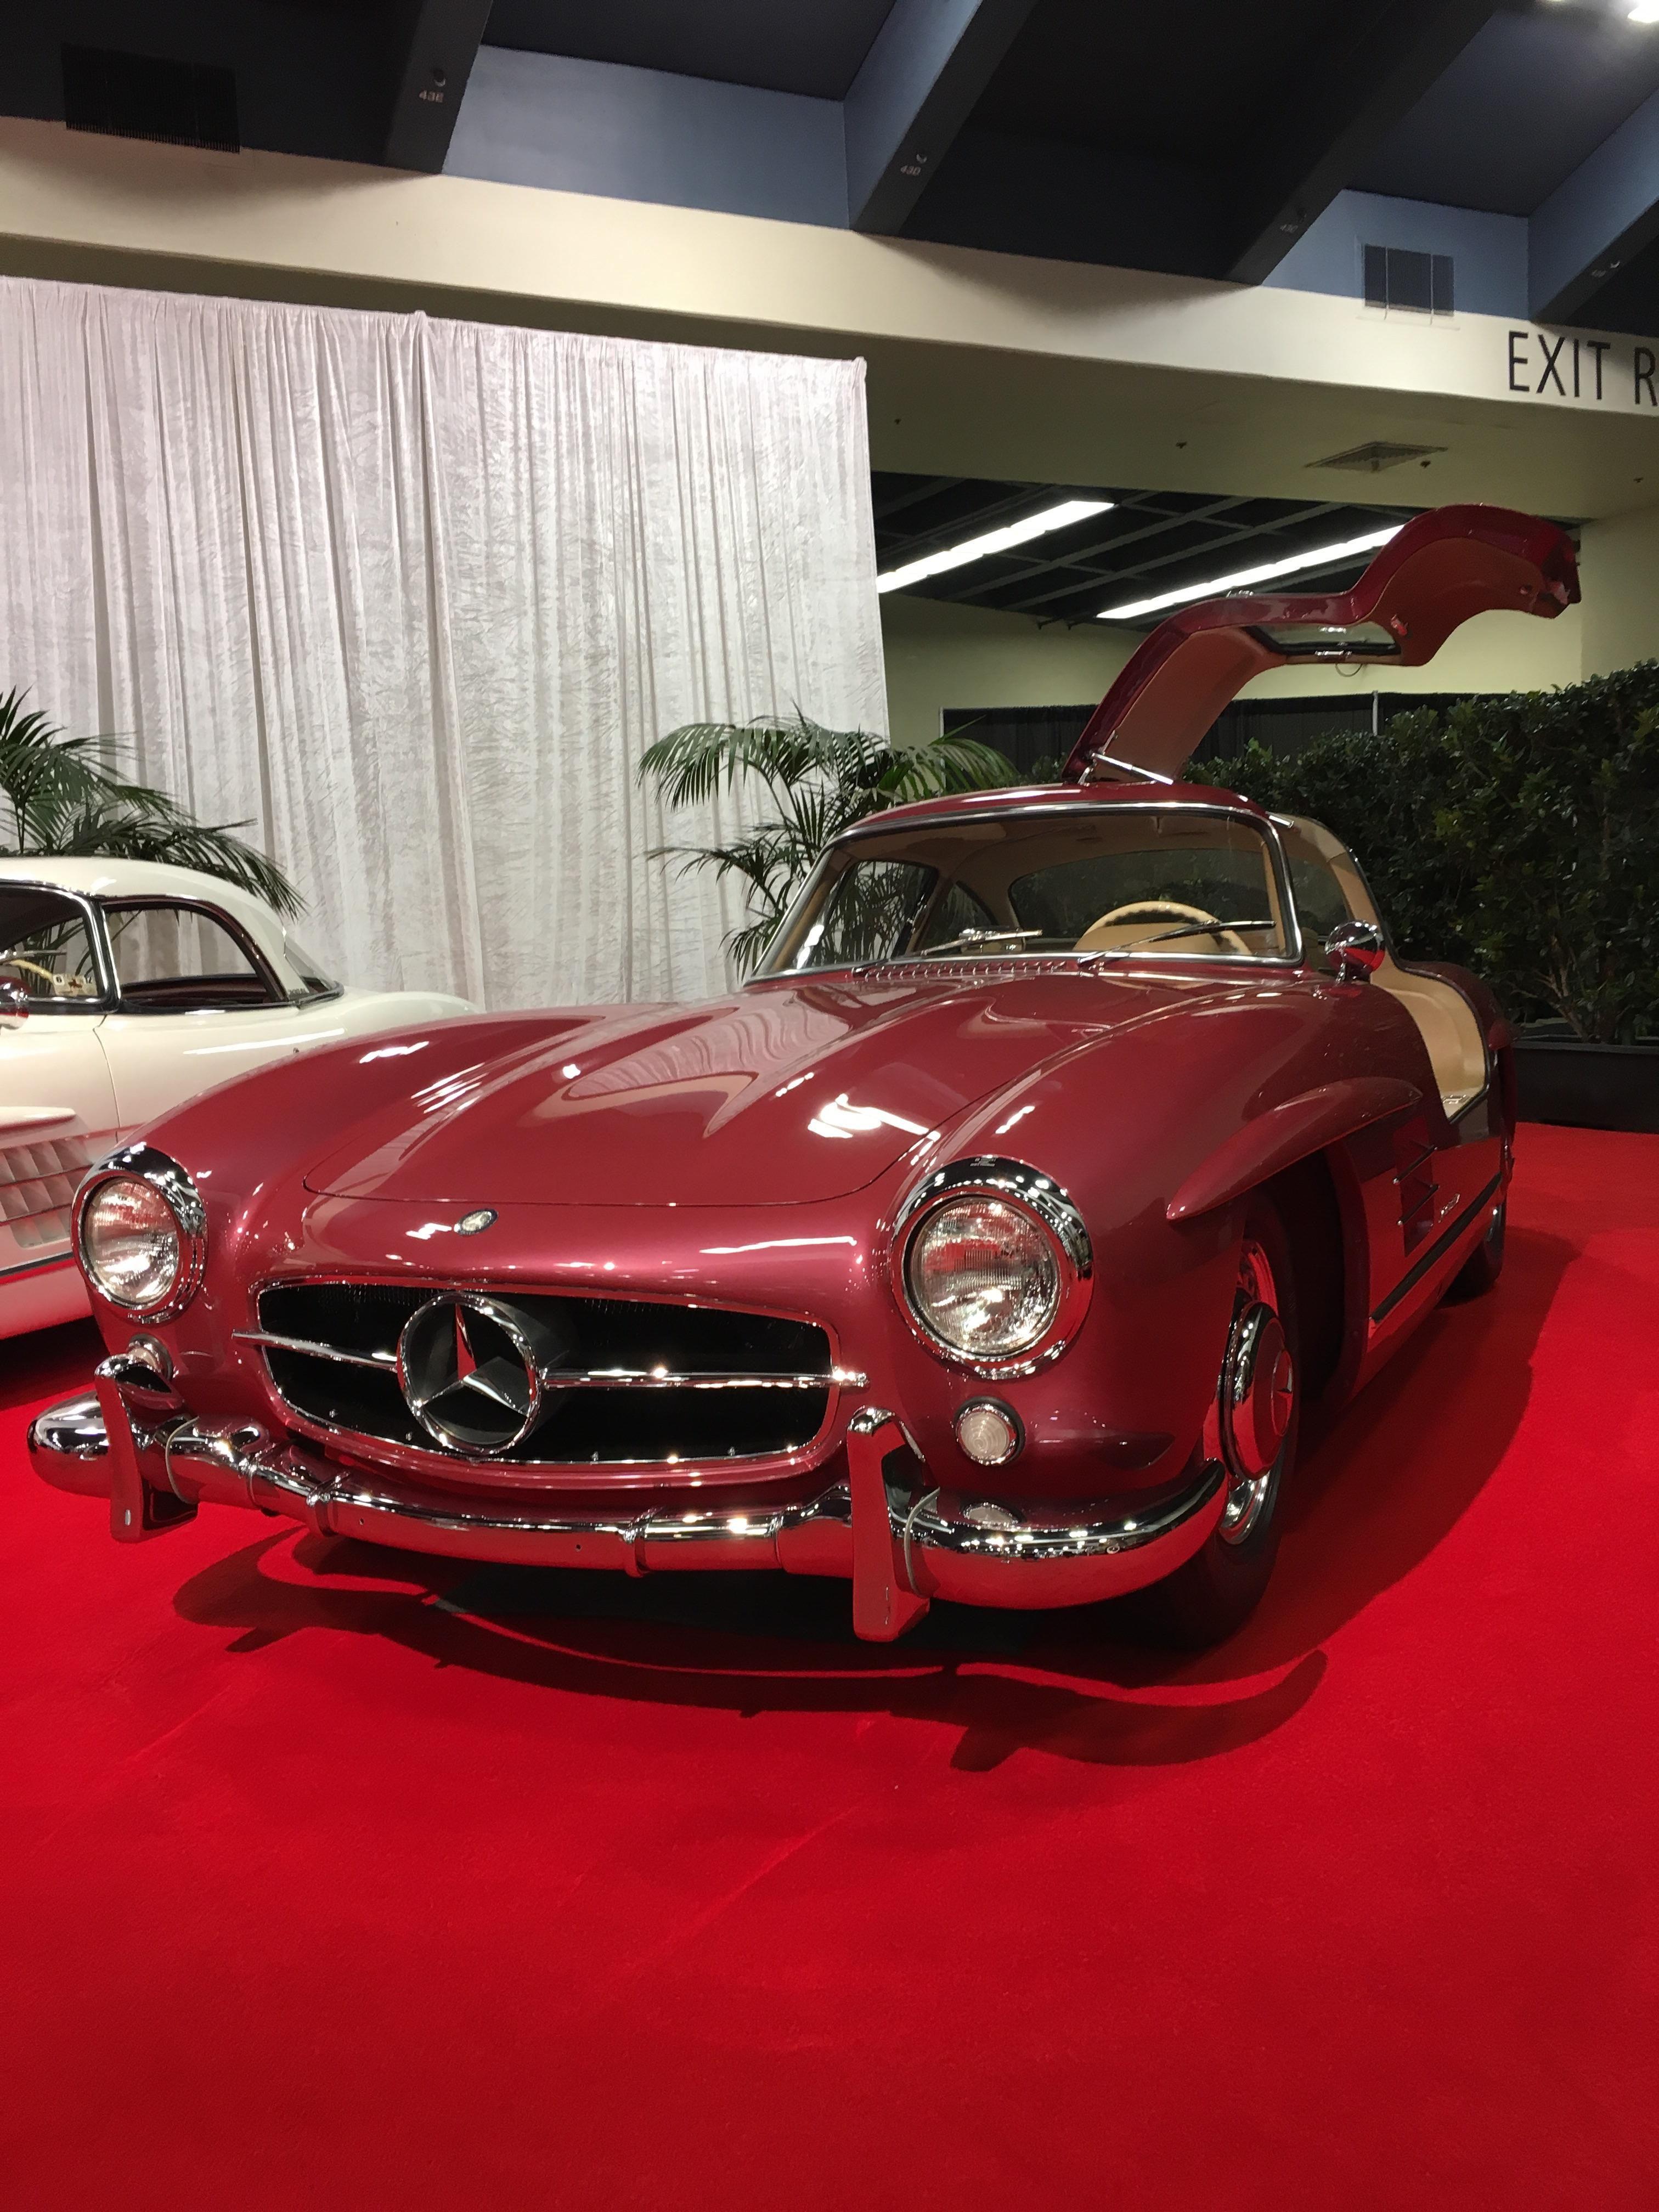 Mercedes 300sl from the San Francisco Auto Show 3024 x 4032 via